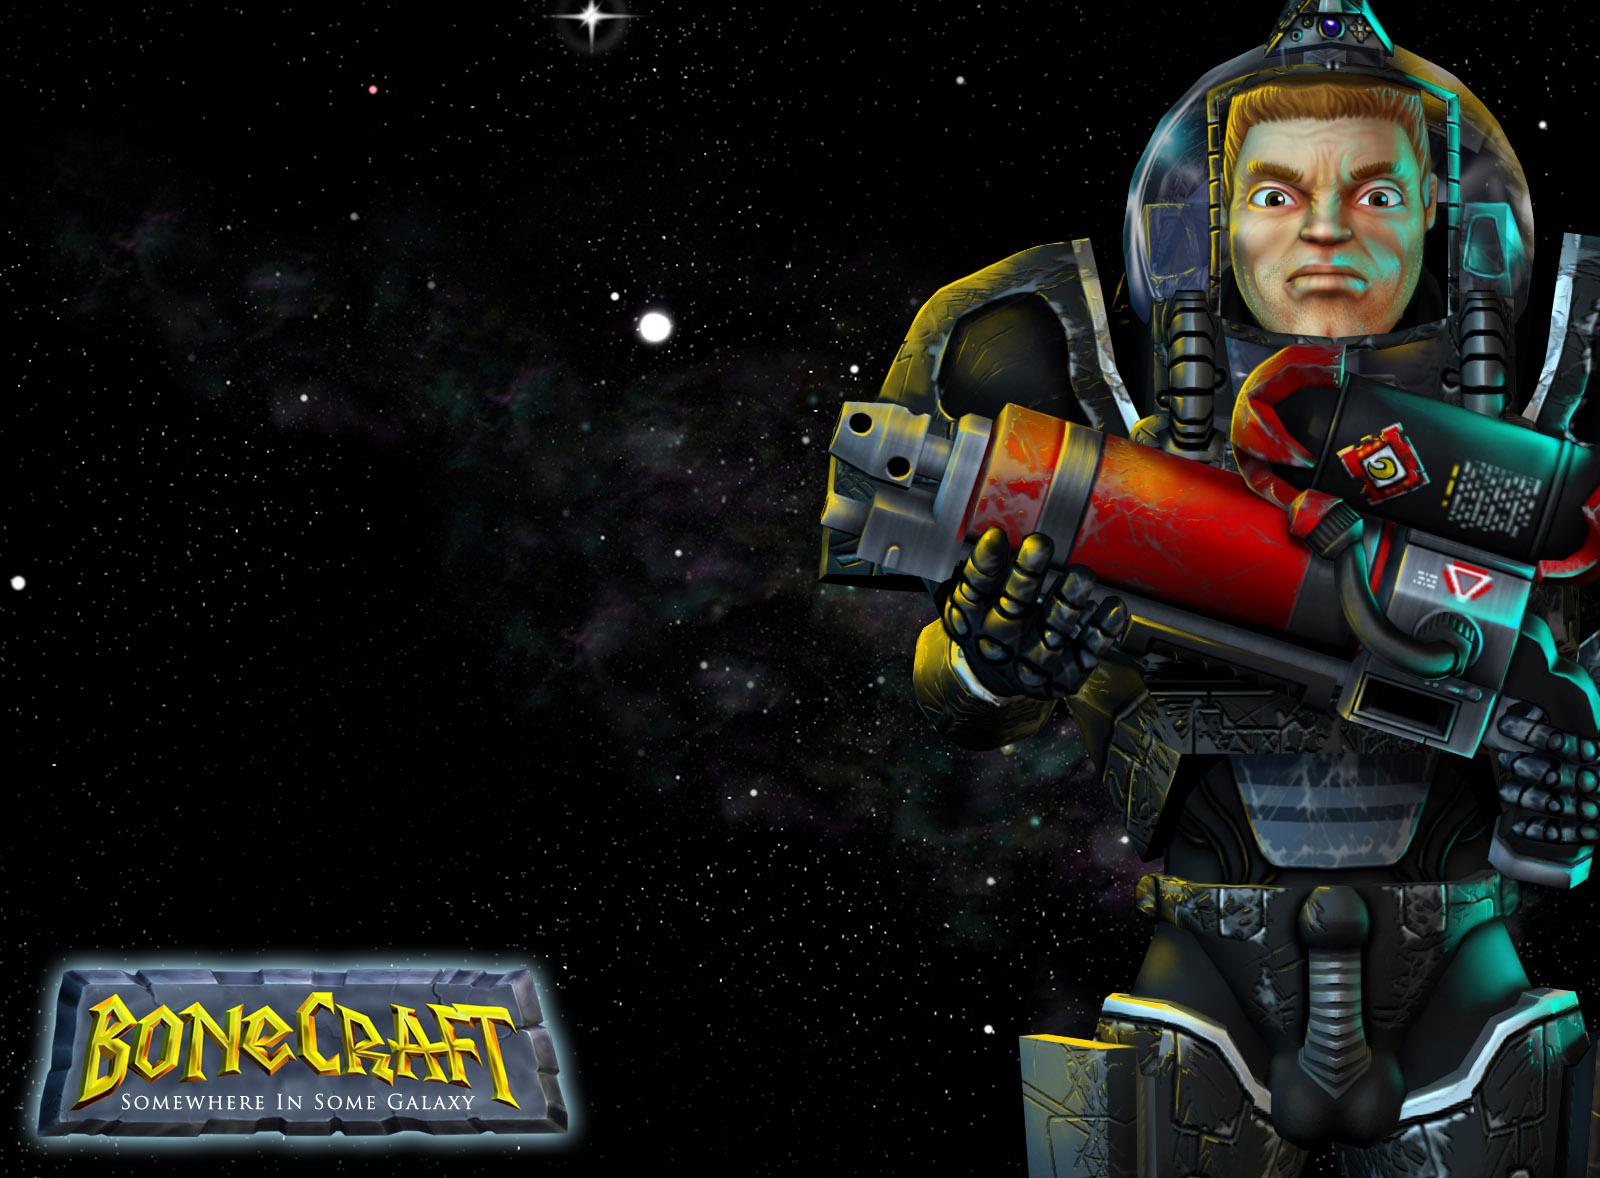 BoneCraft Space Wrangler Wallpaper 2